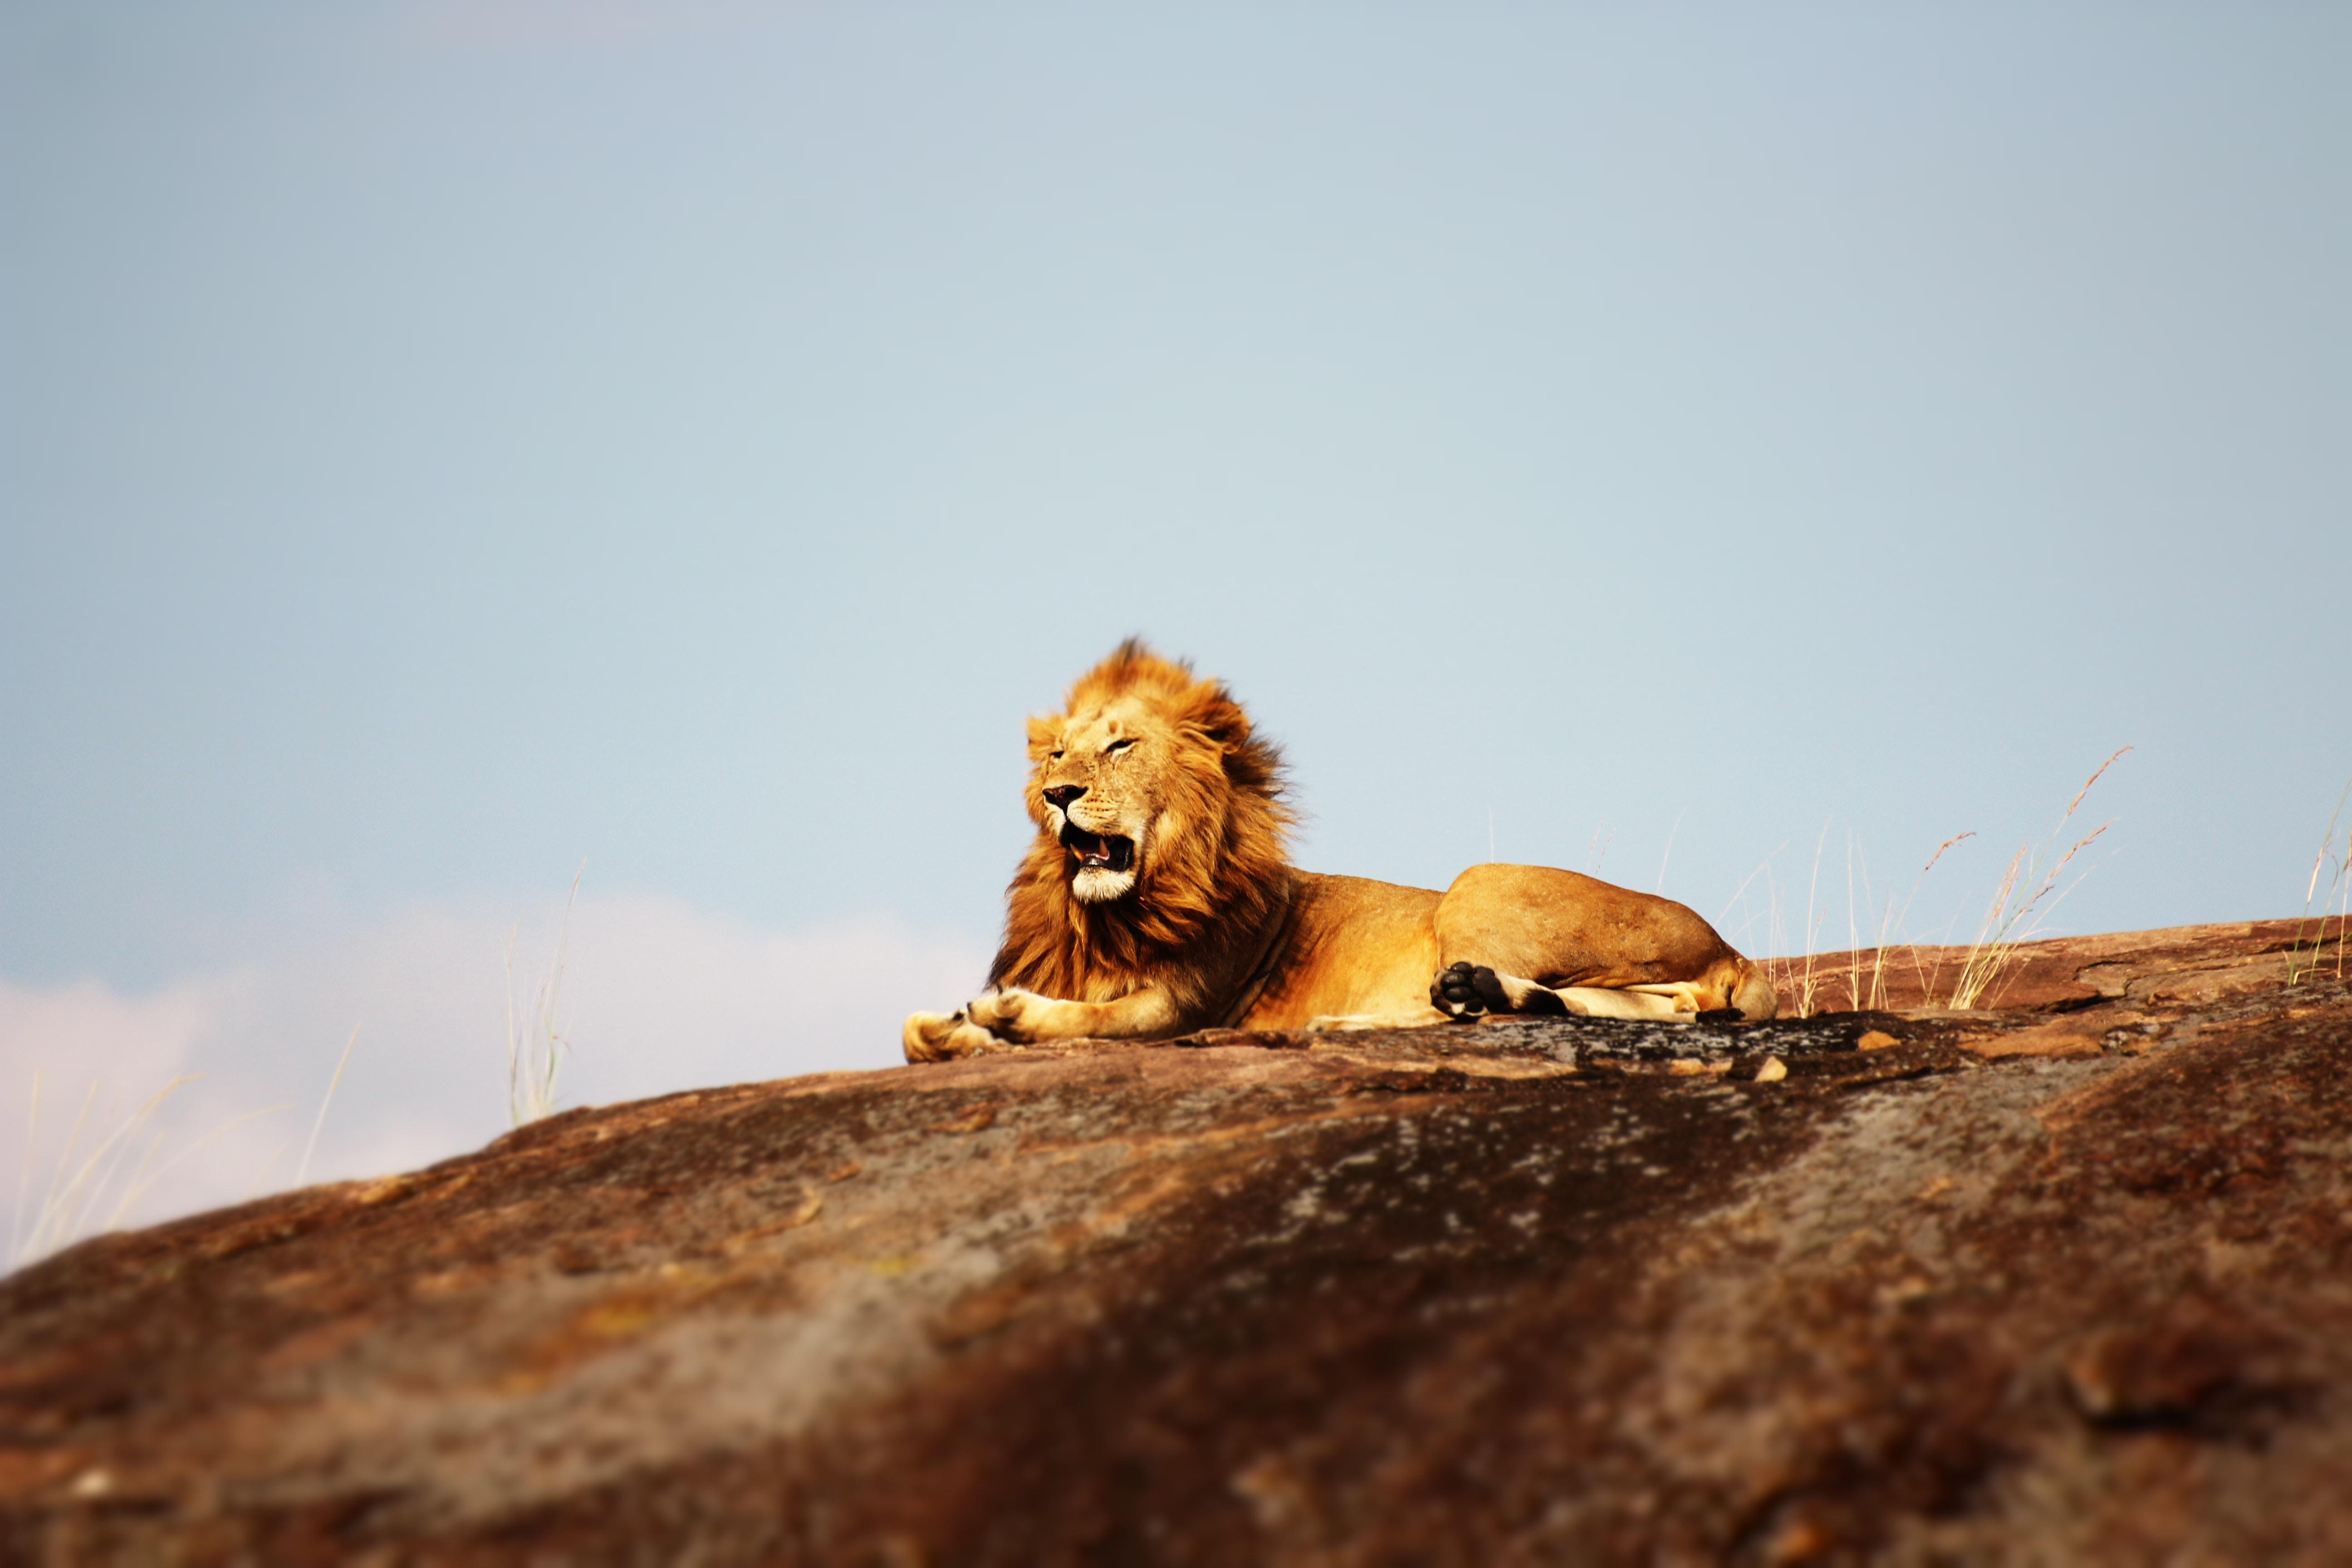 lion open mouth 1574938129 - Lion Open Mouth -